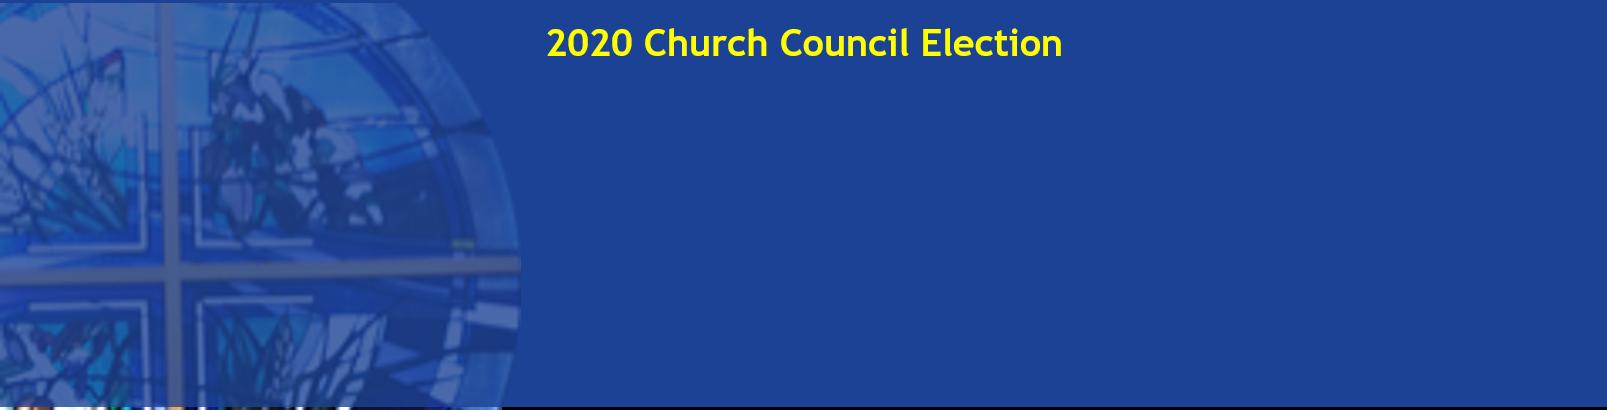 2020 CC Election Voting Form